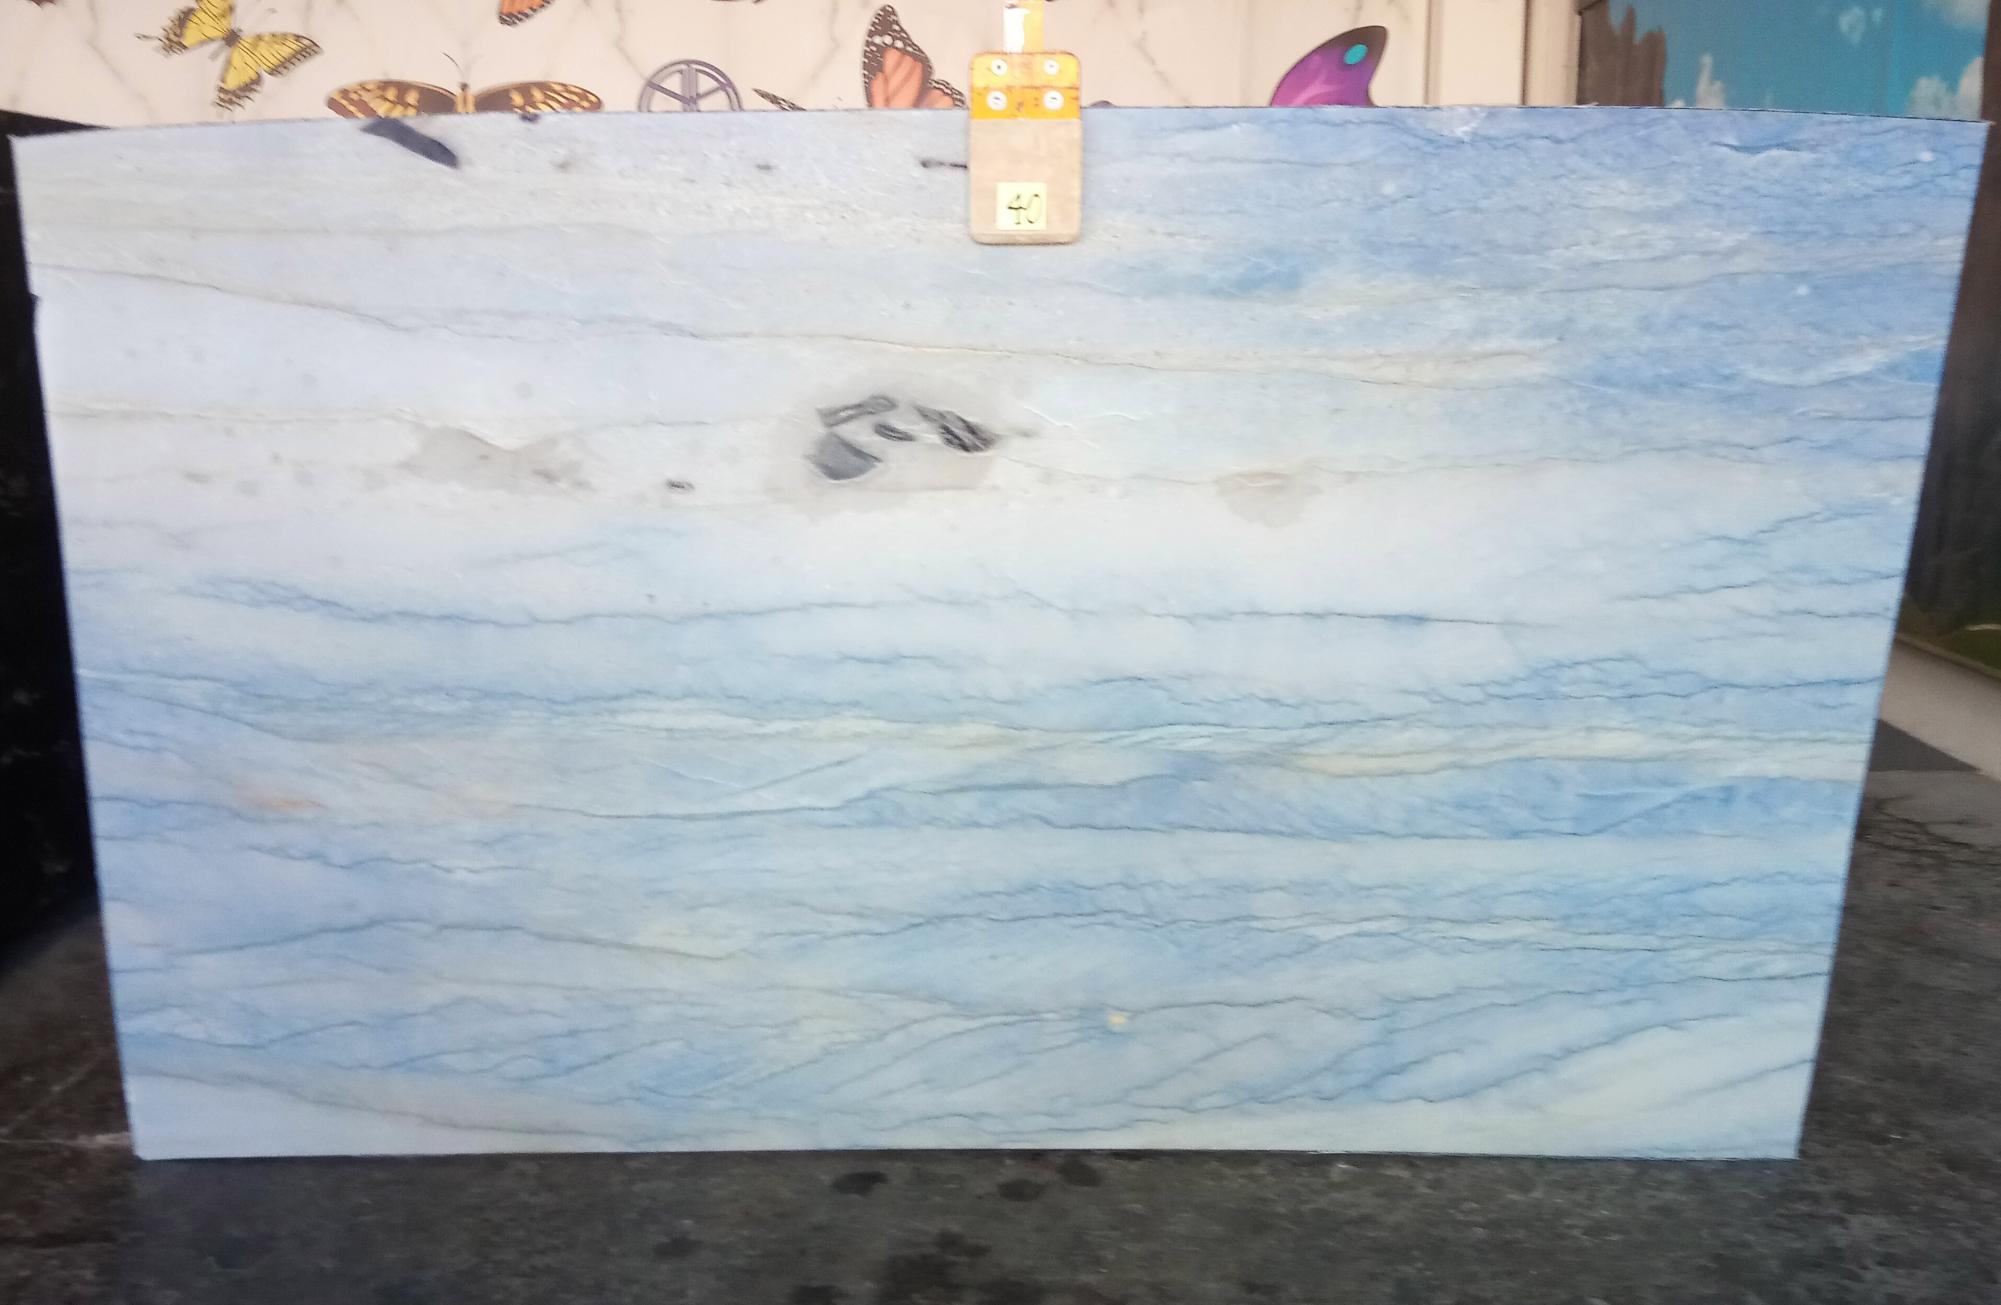 AZUL MAKAUBA polierte Unmaßplatten Z0191 aus Natur Marmor , Slab #40: Lieferung Veneto, Italien